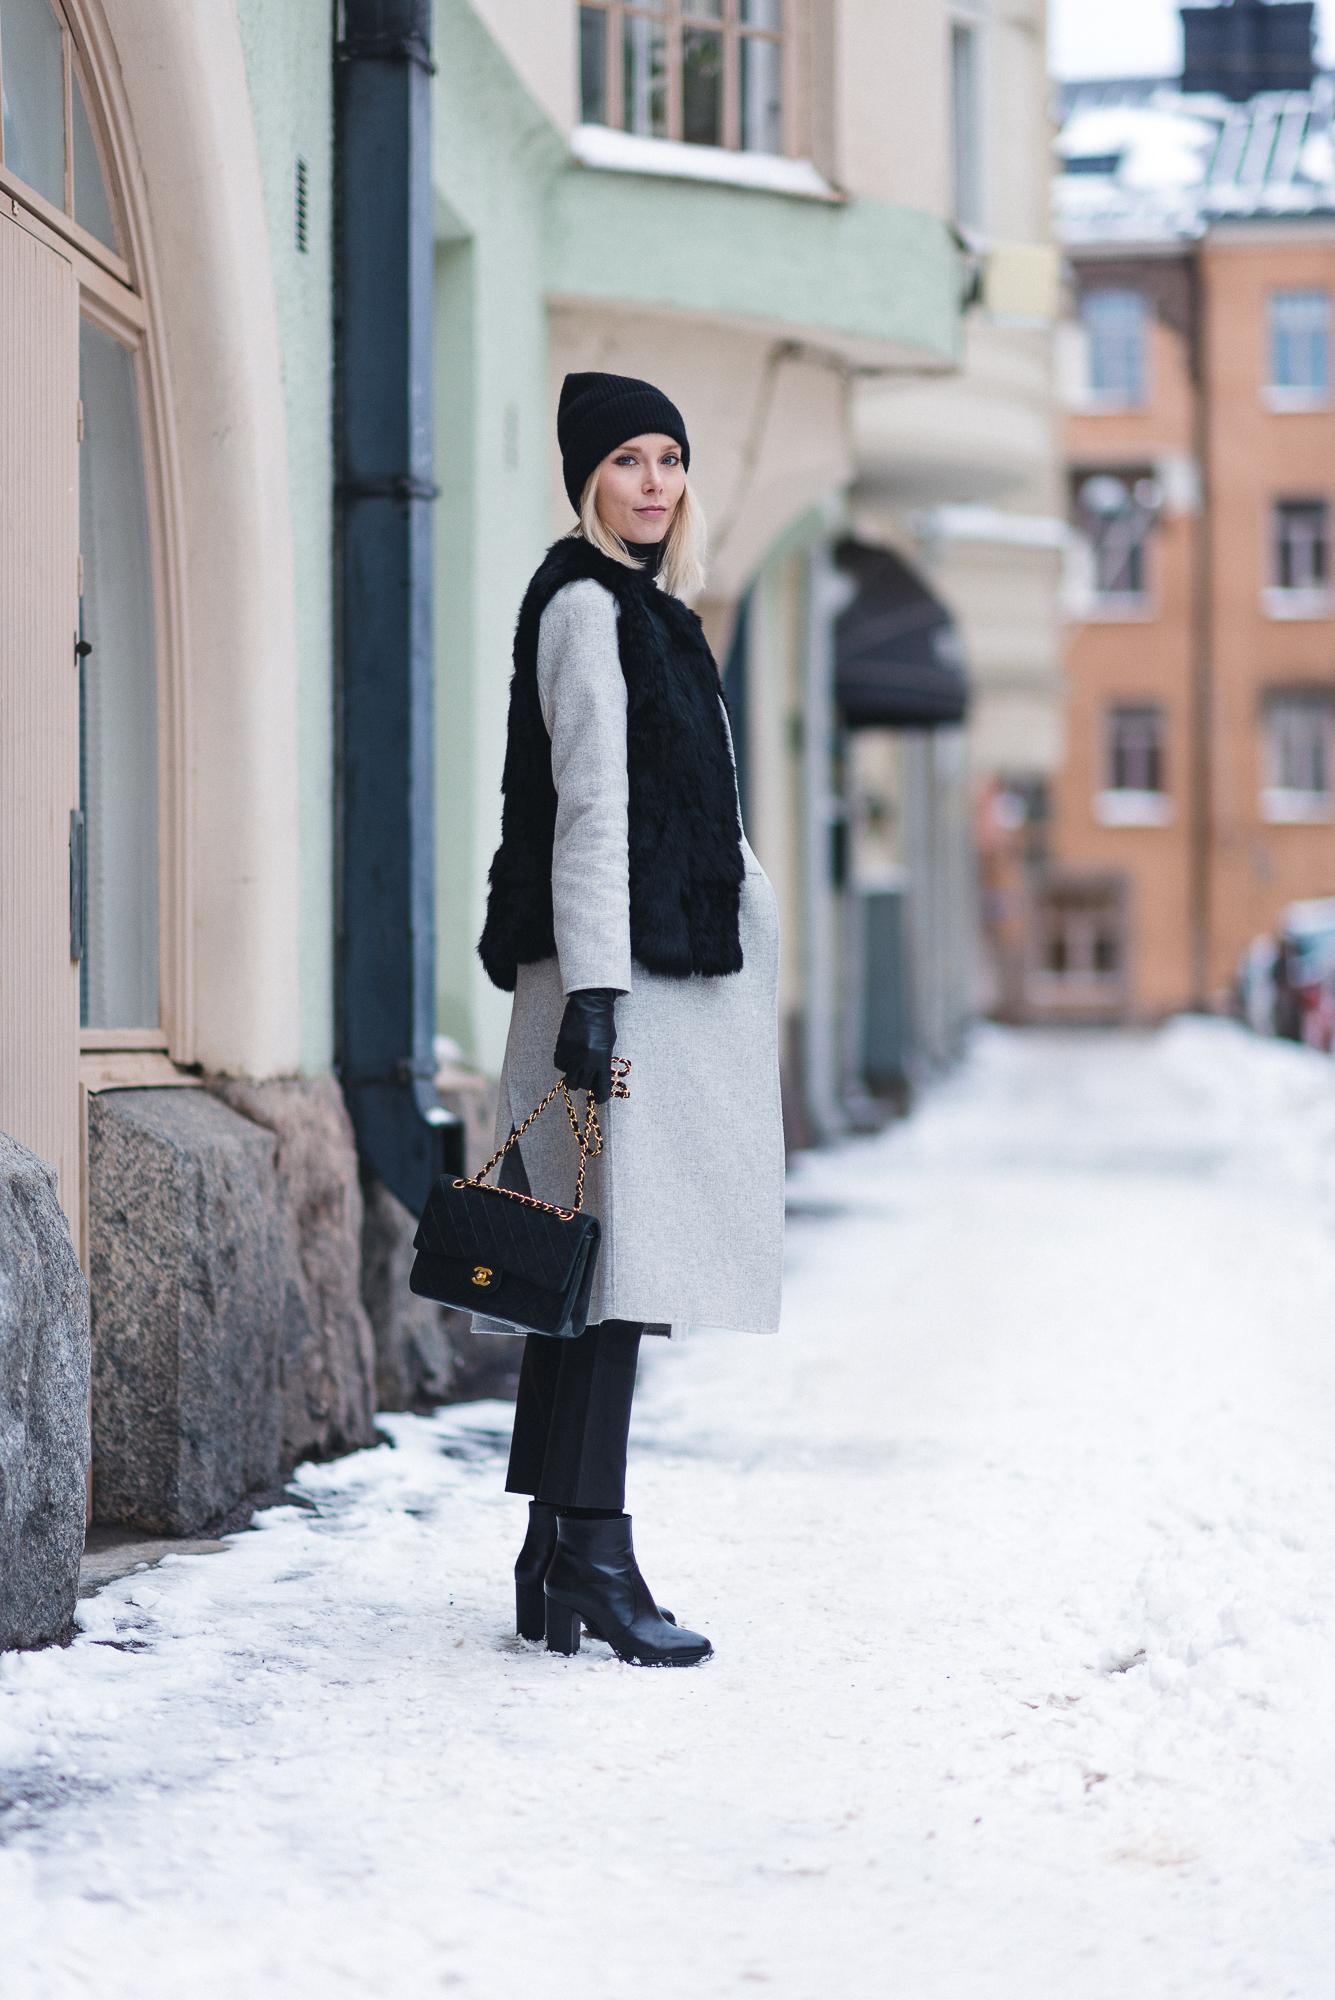 anna-sofia-helsinki-snow-chanel-bag-black-beanie-2